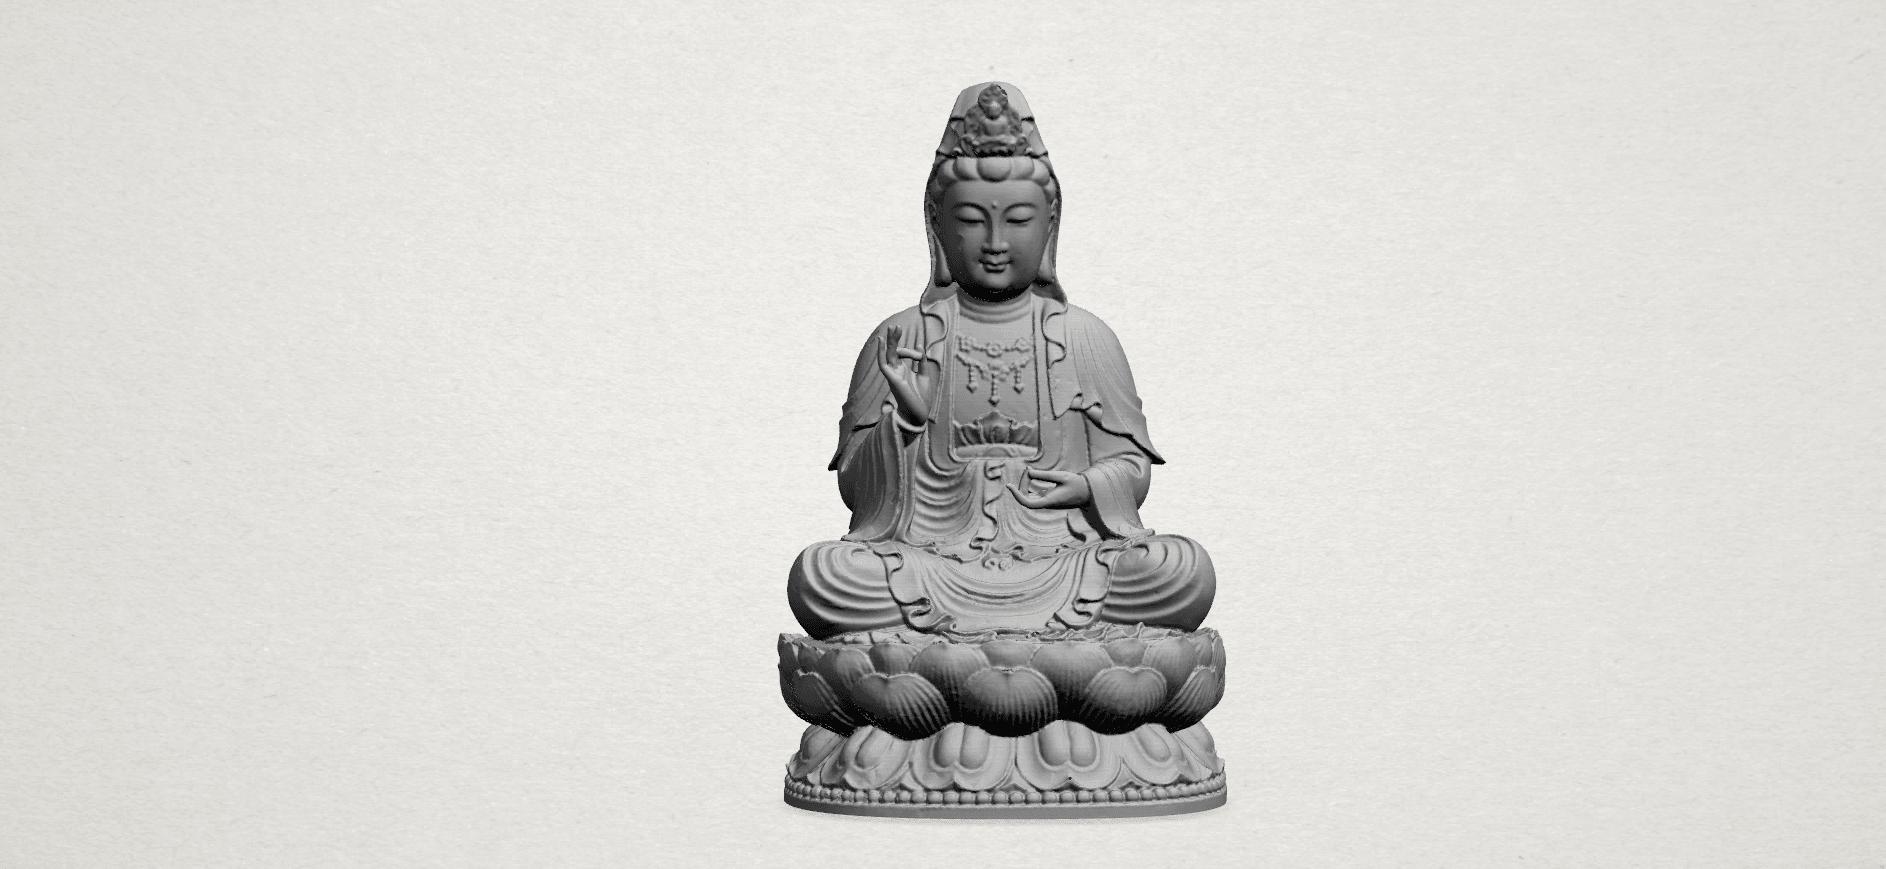 Bodhisattva Buddha - A01.png Download free STL file Avalokitesvara Bodhisattva 01 • 3D print object, GeorgesNikkei